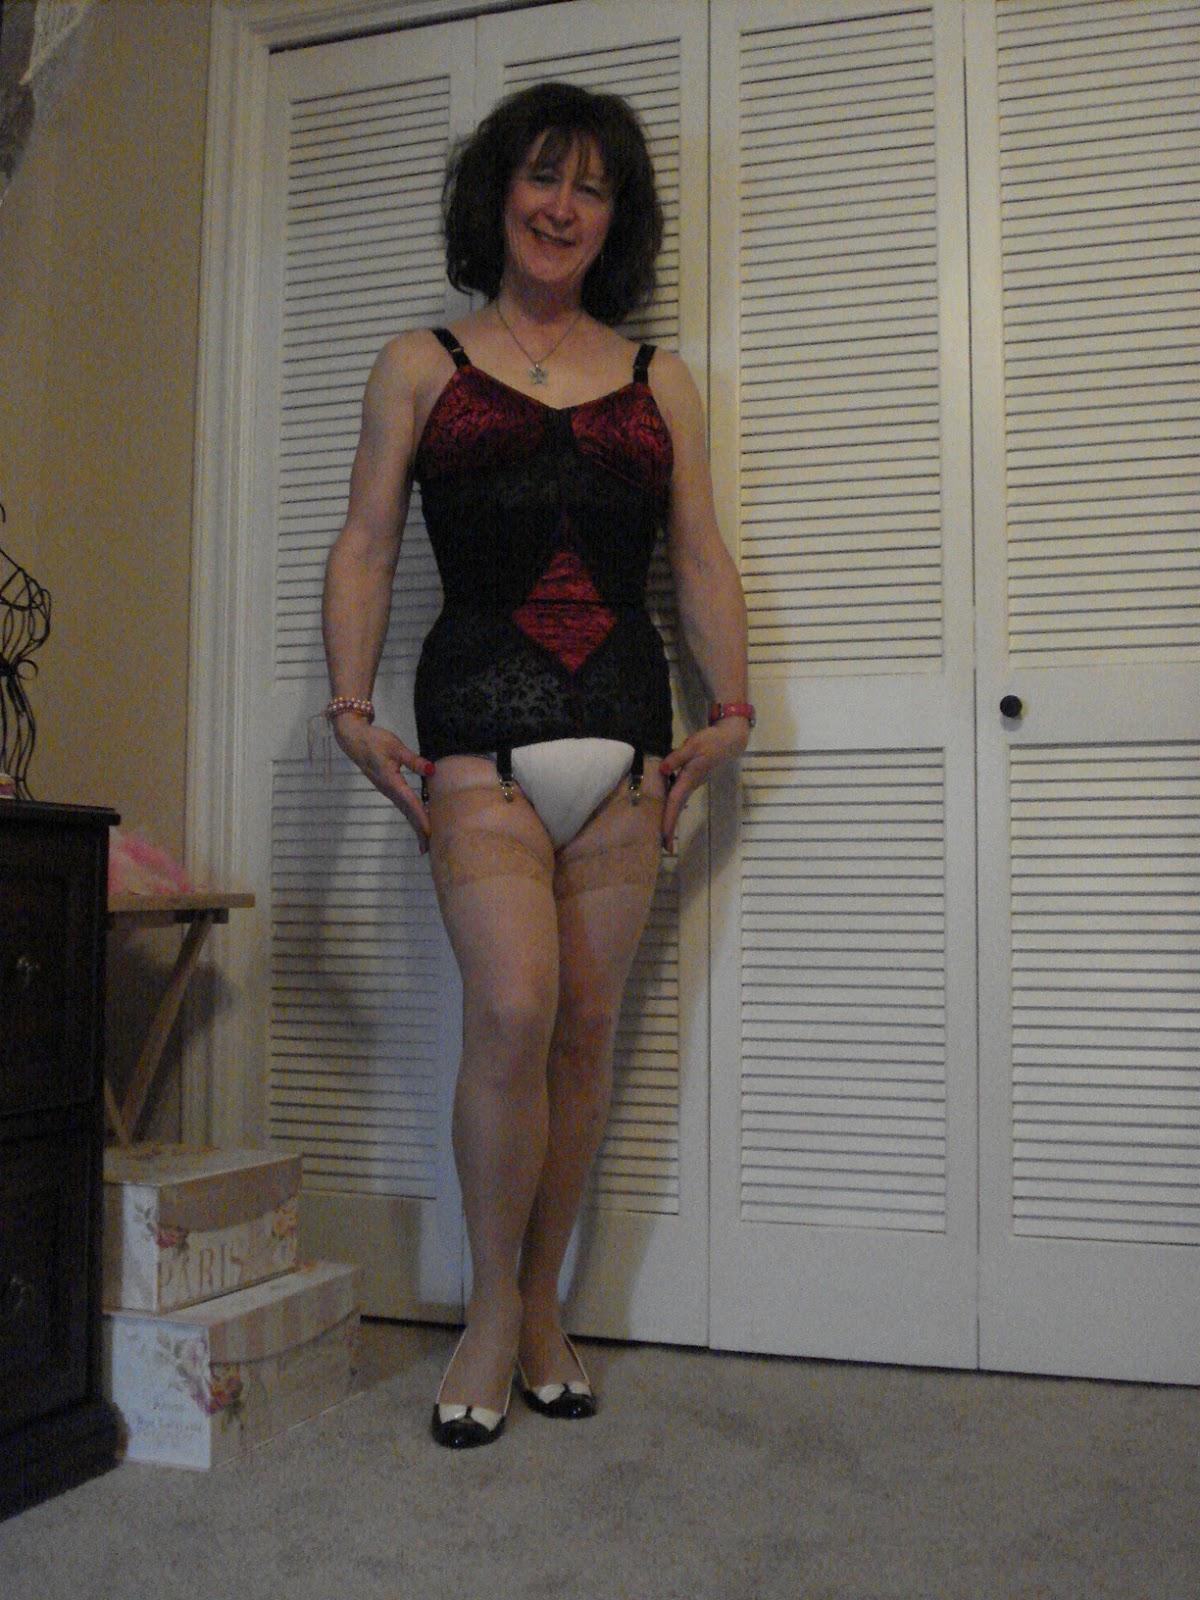 and transvestite